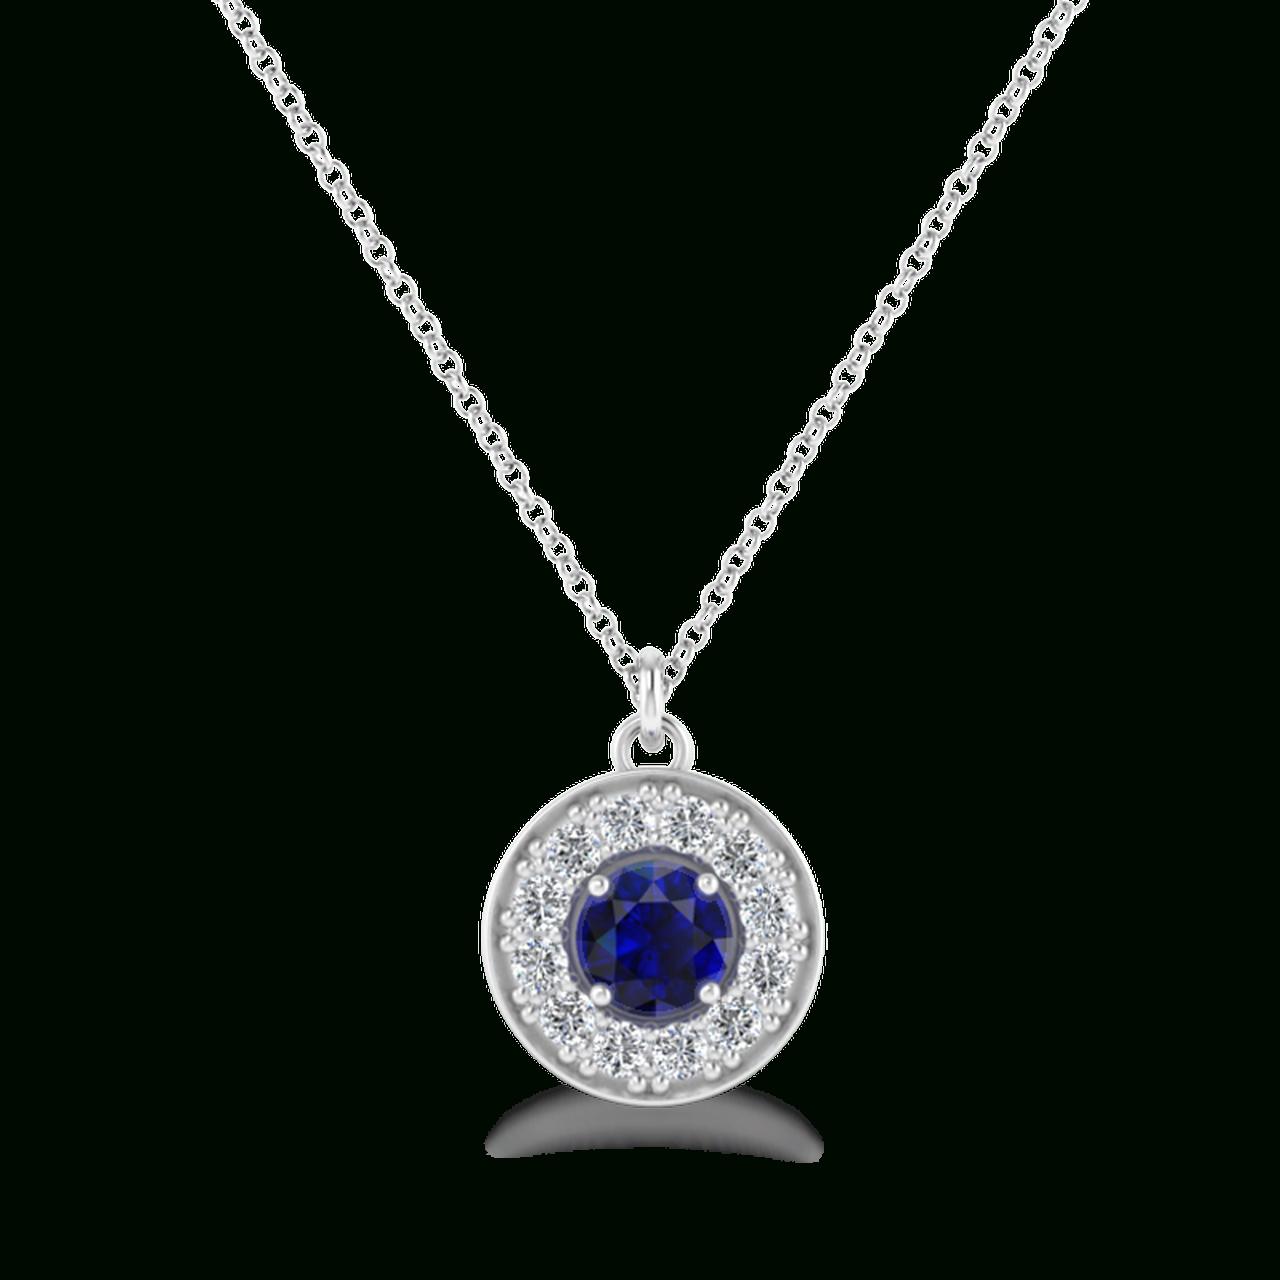 Megan Diamond & Sapphire Halo Necklace Regarding 2019 Square Sparkle Halo Pendant Necklaces (Gallery 19 of 25)